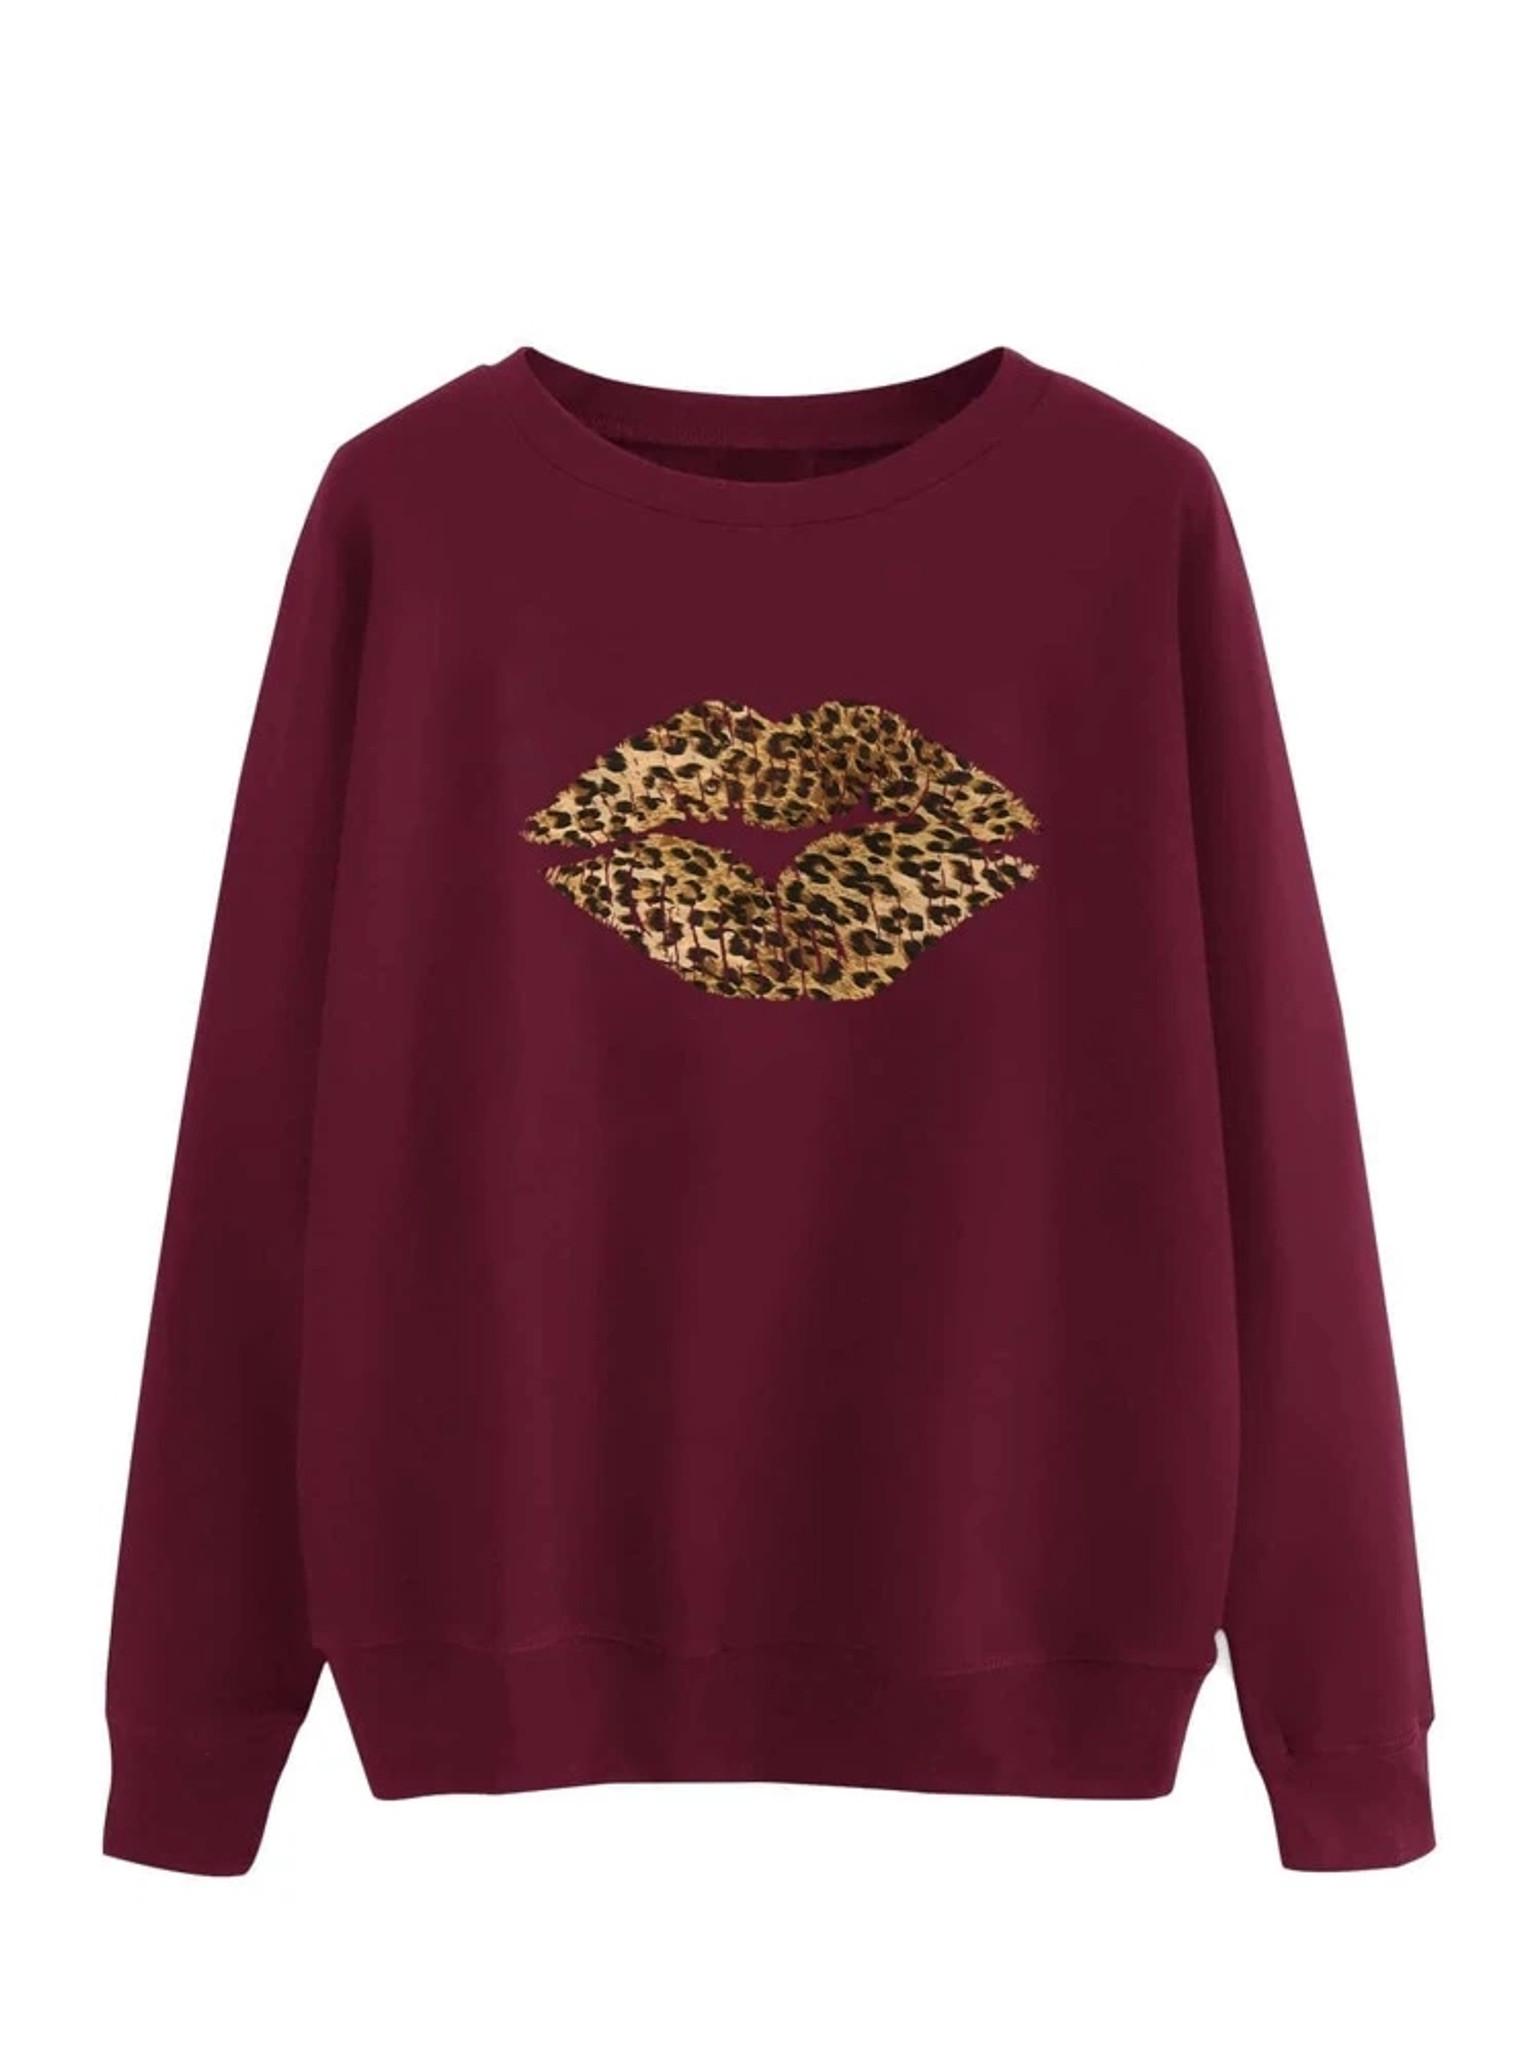 Fifth Avenue DIFT20 Leopard Lip Printed Sweatshirt - Maroon